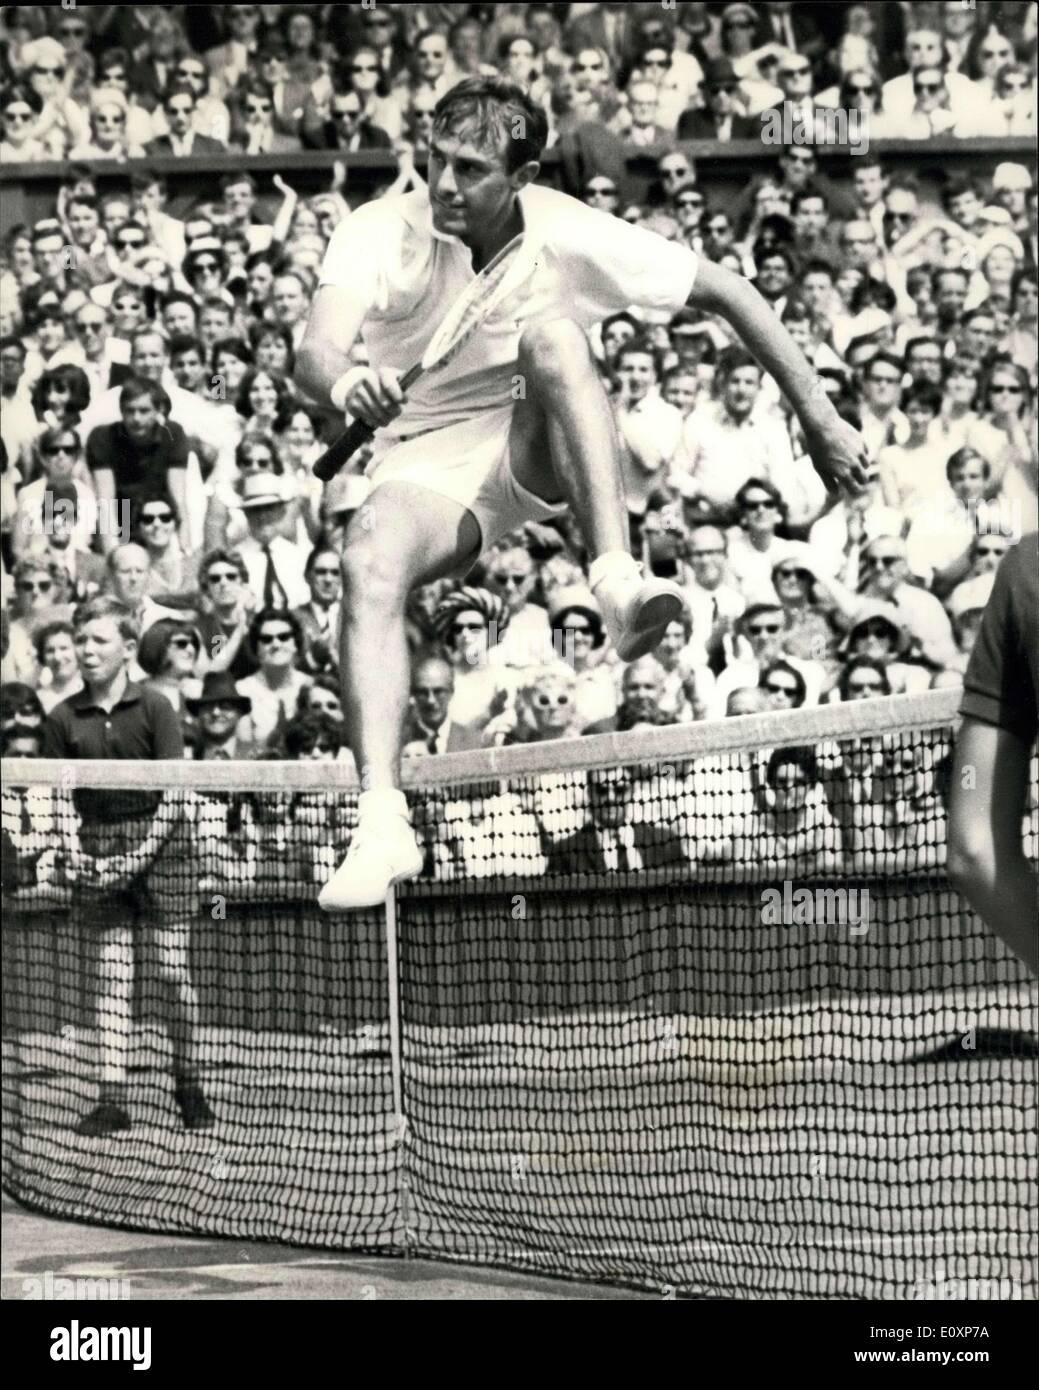 Jul 07 1967 Tennis at Wimbledon New be Wins Men s Singles